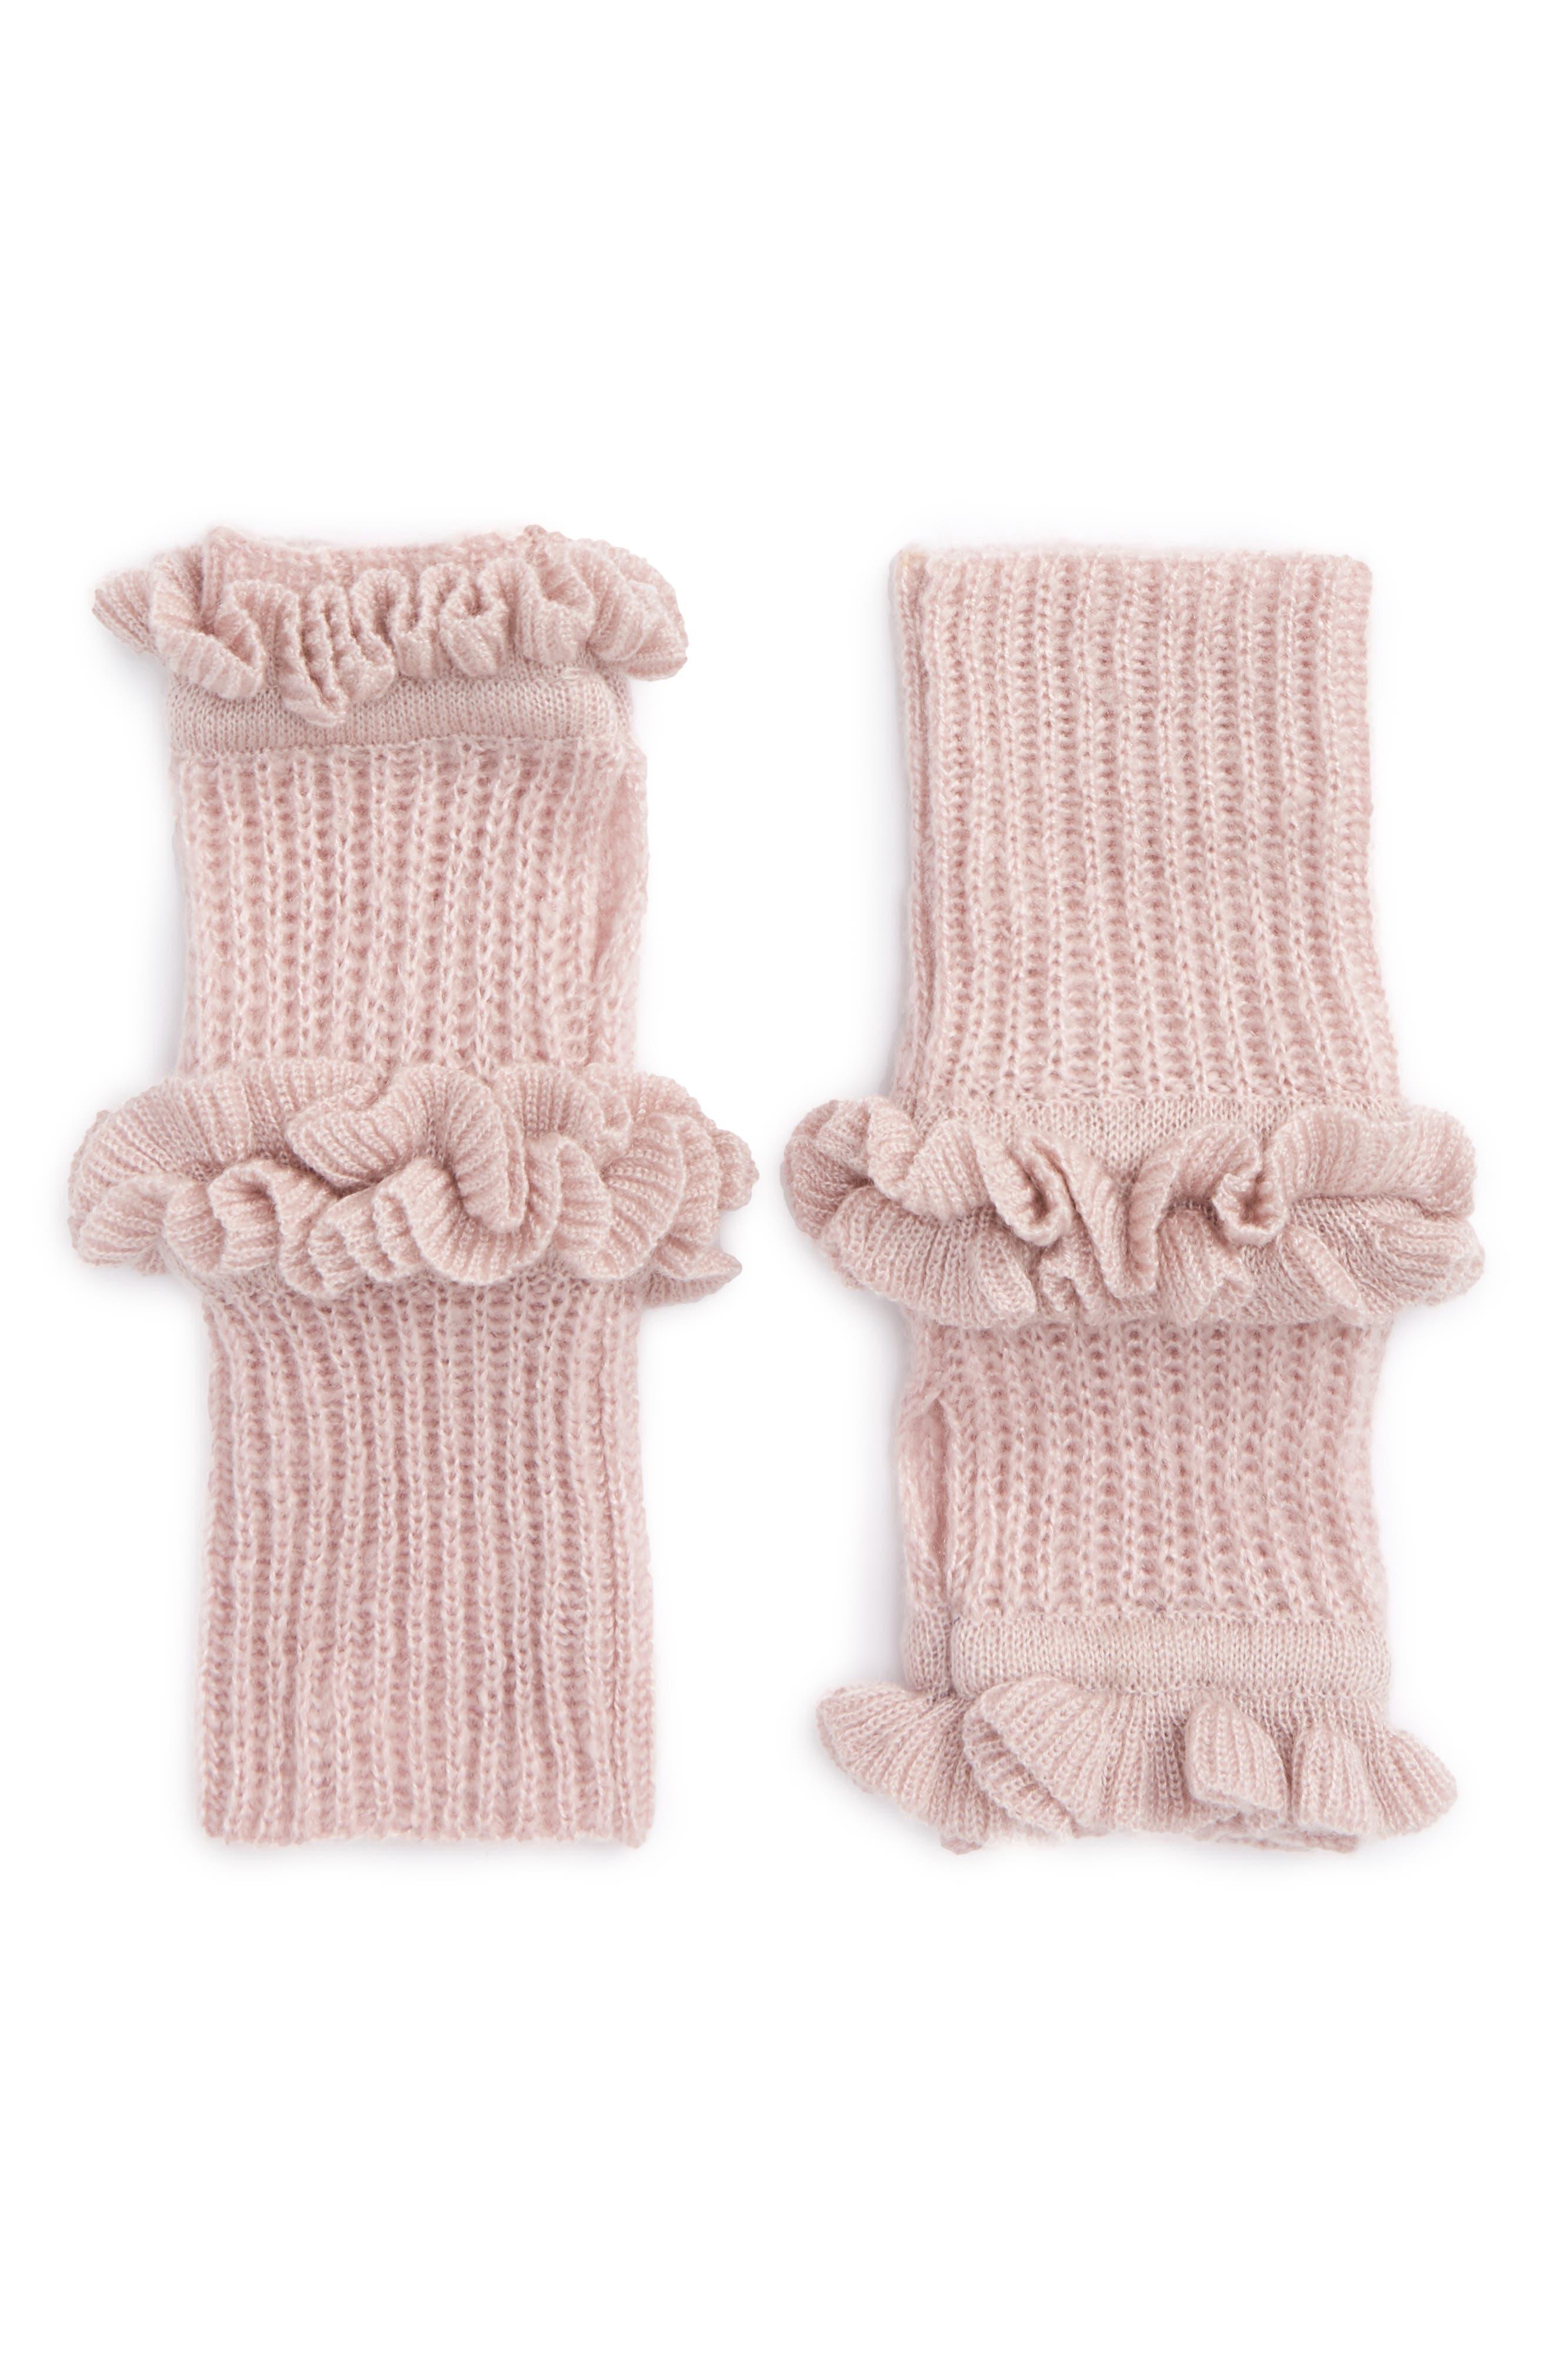 Rebecca Minkoff Ruffle Fingerless Gloves